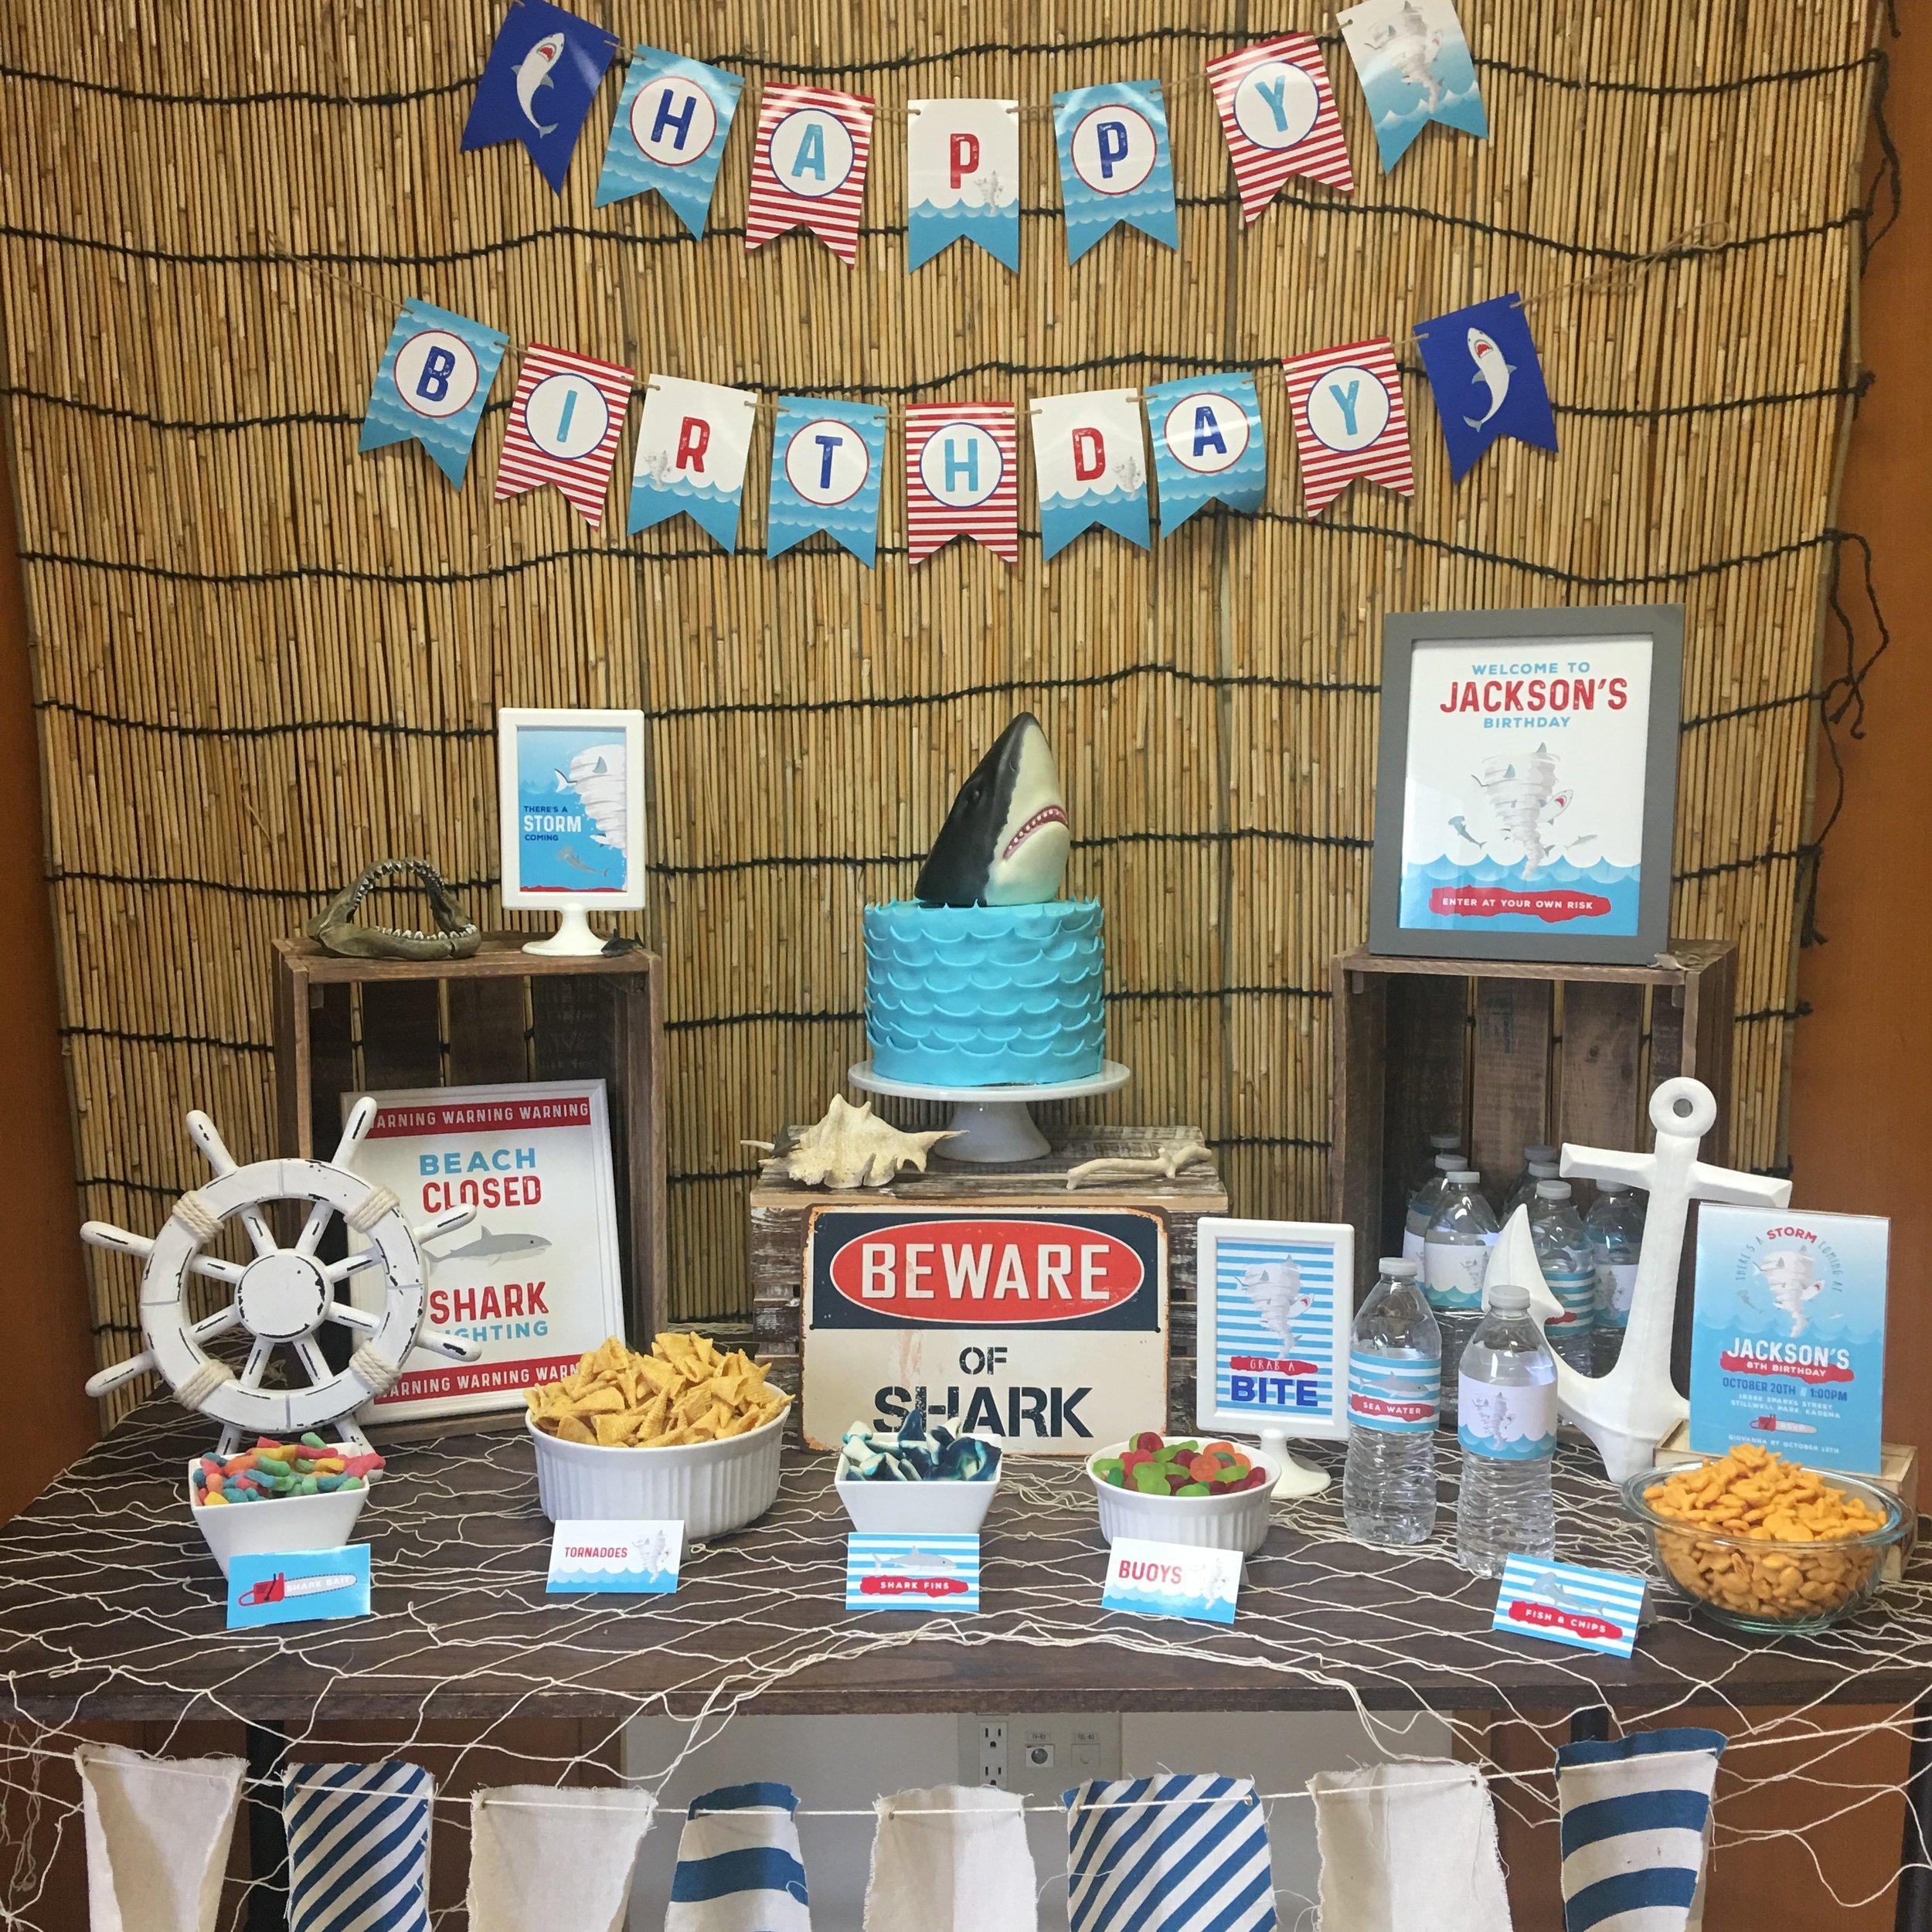 Sharknado Birthday Party theme designed by MKKM Designs